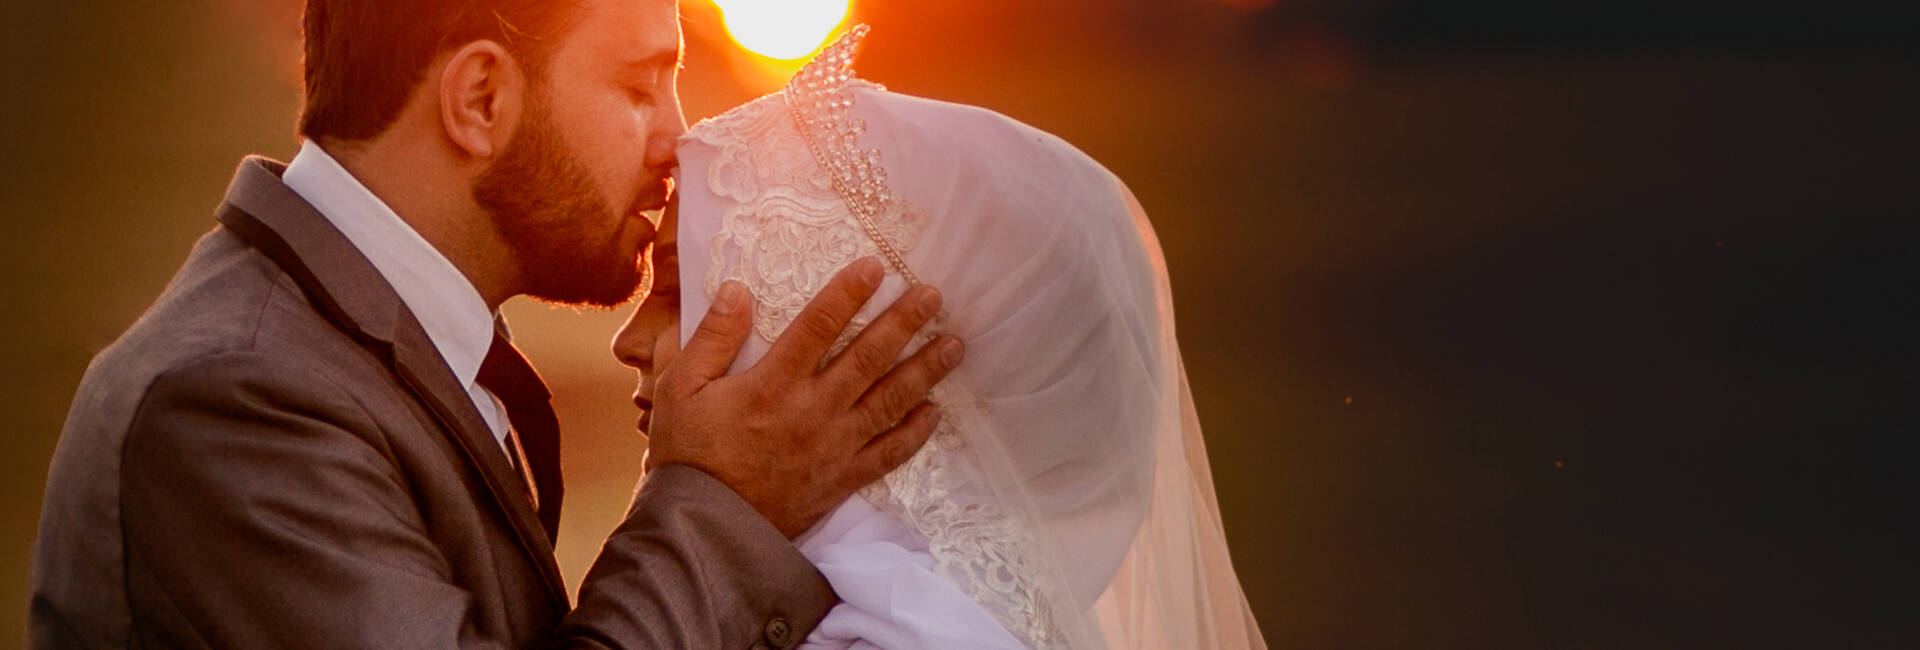 Wedding de Zeinab + Mohamad